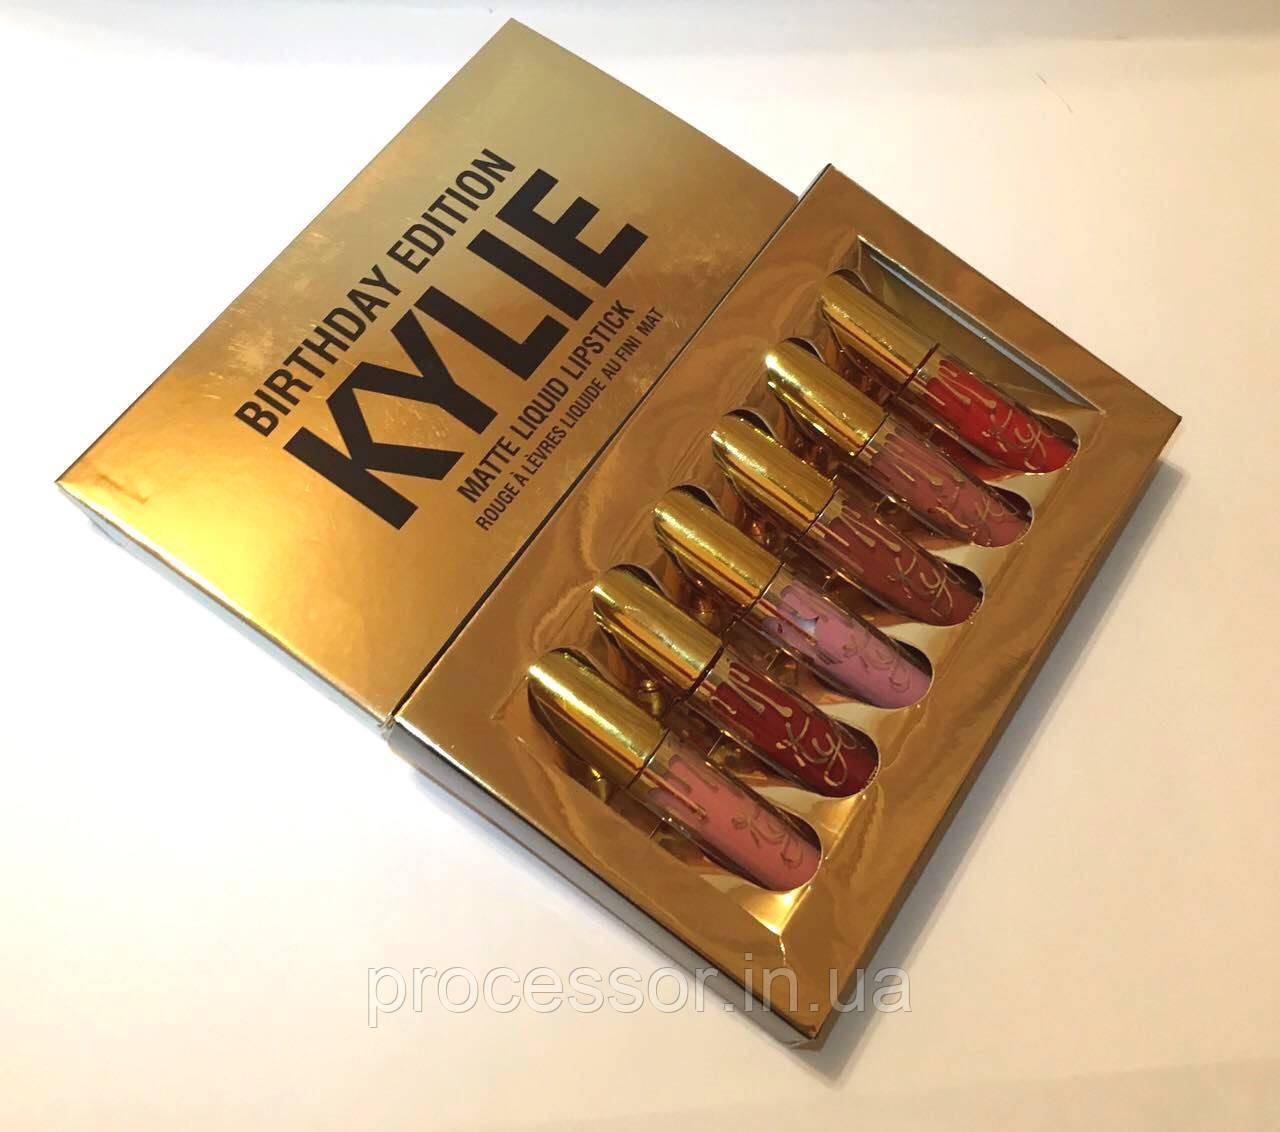 Набор матовых жидких помад Kylie Birthday Edition 6шт Оригинал! Made in U.S.A.